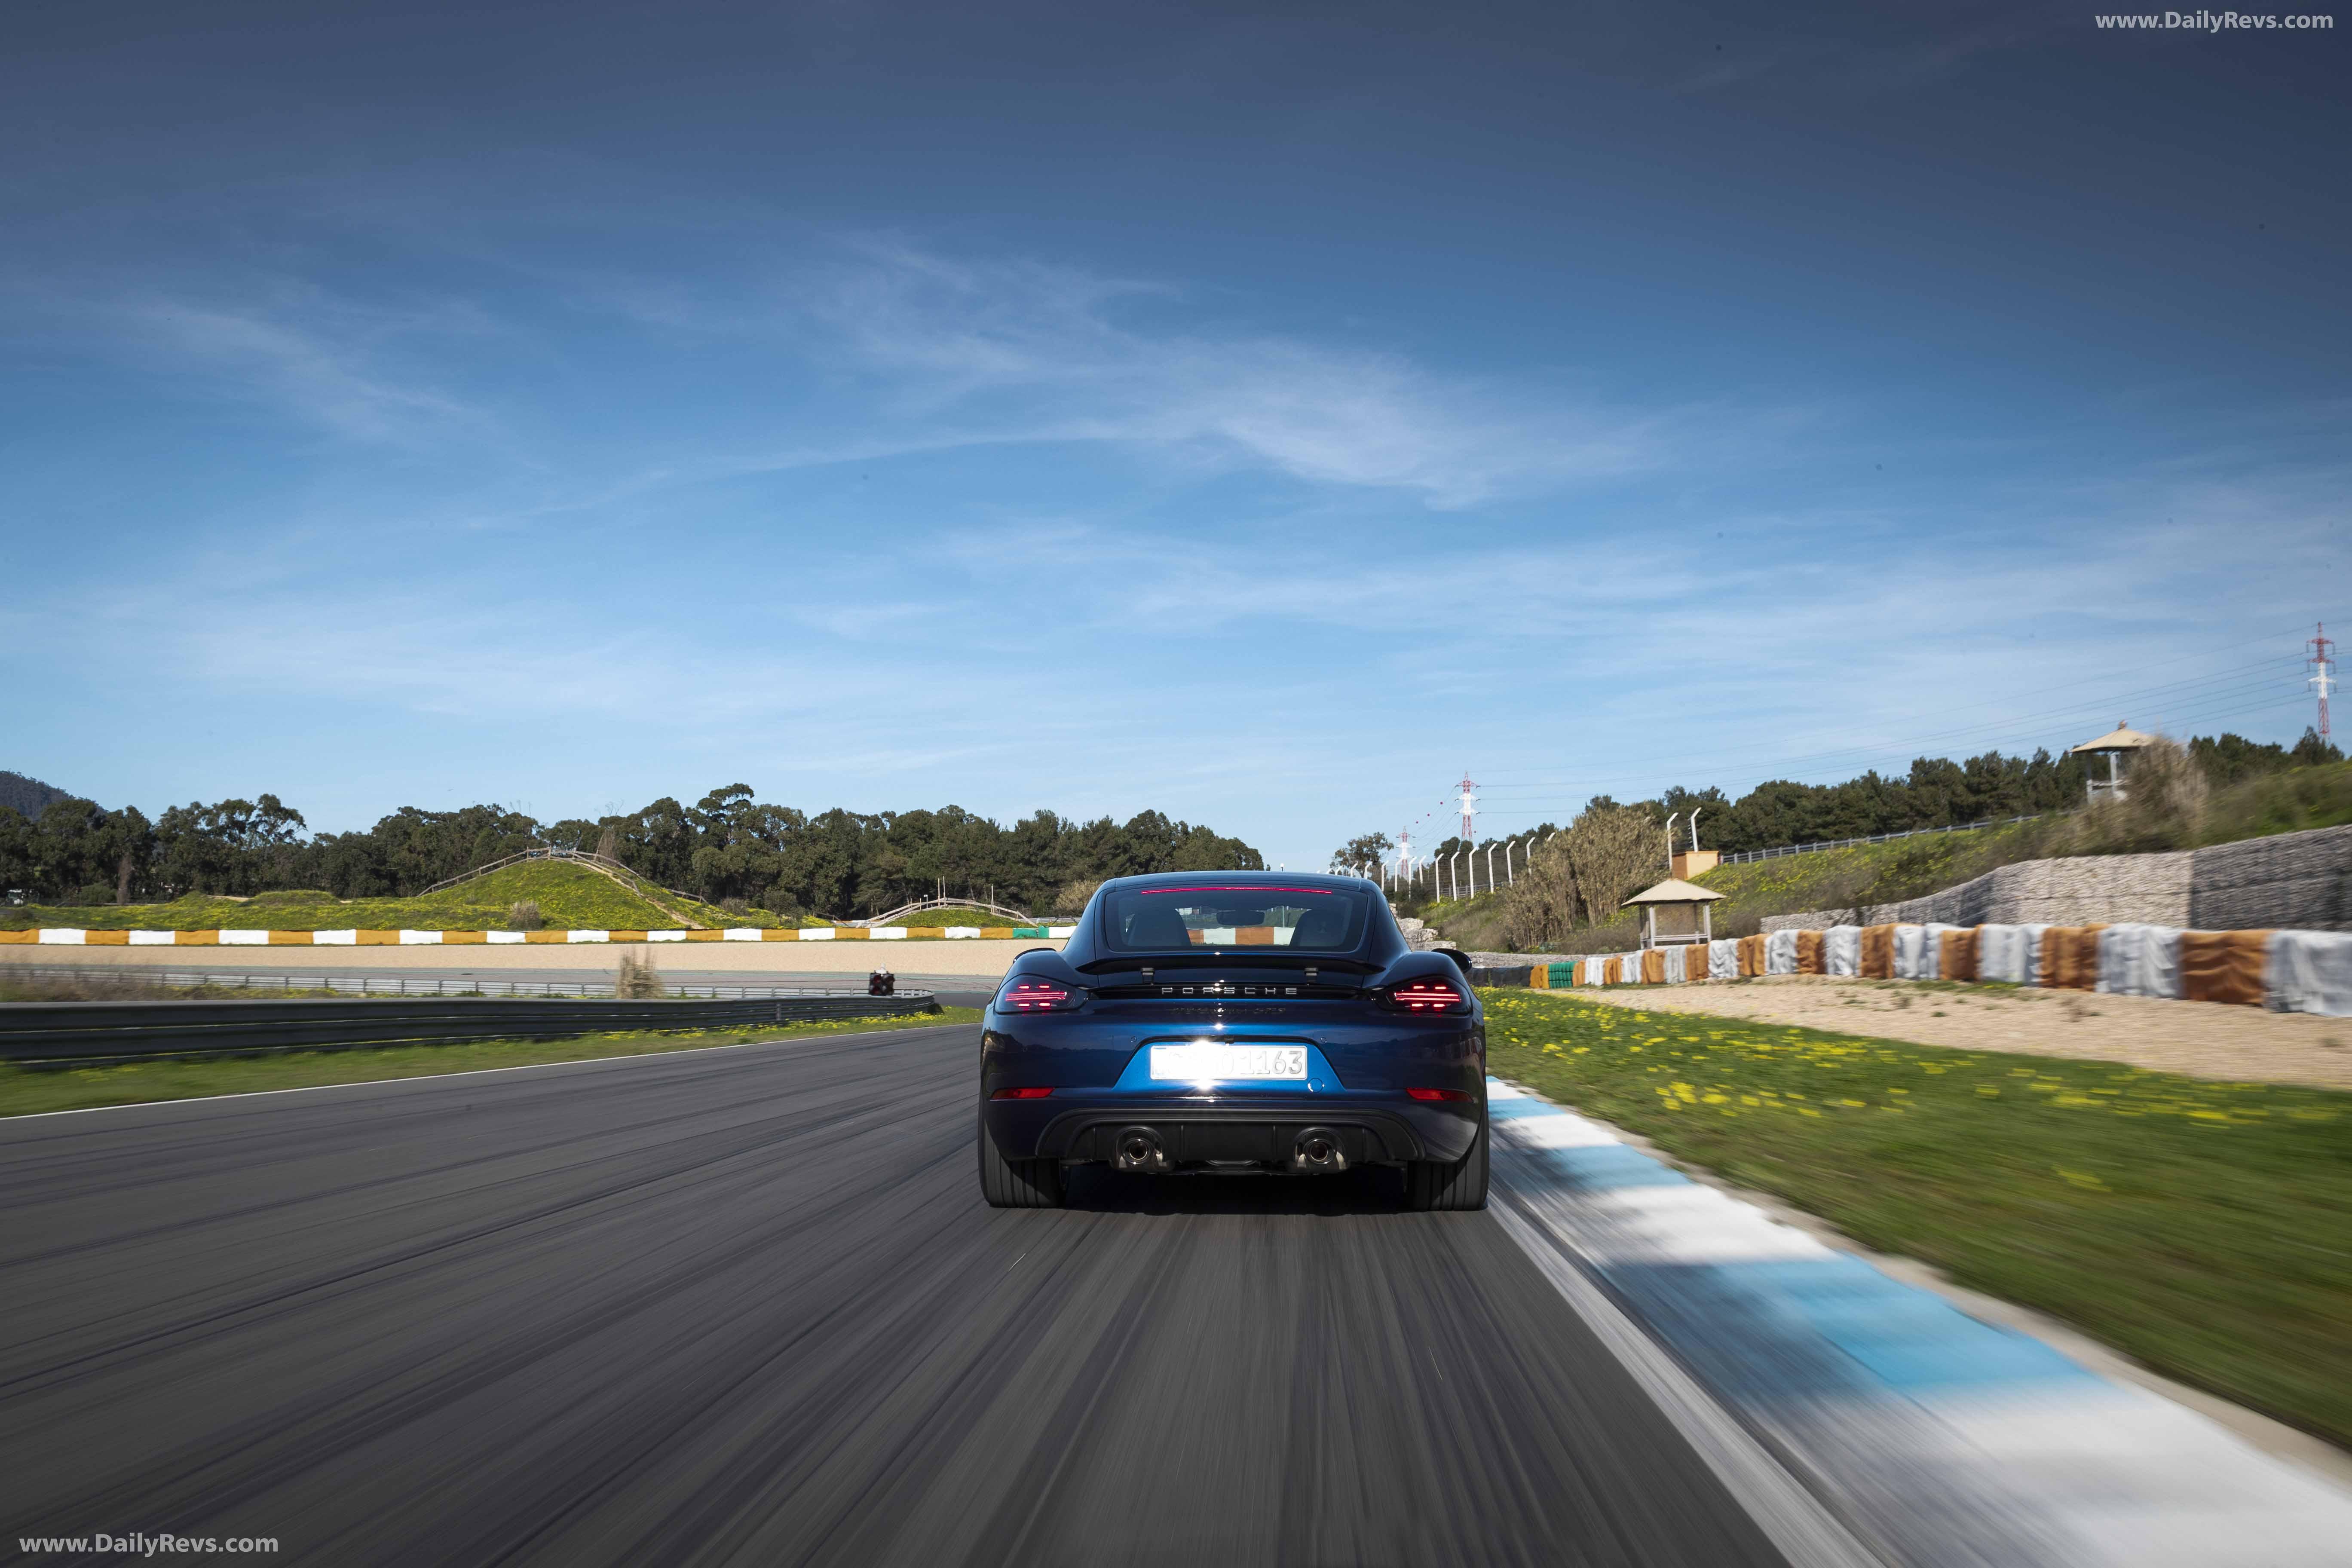 2020 Porsche 718 Cayman GTS 4.0 - HD Pictures, Videos ...